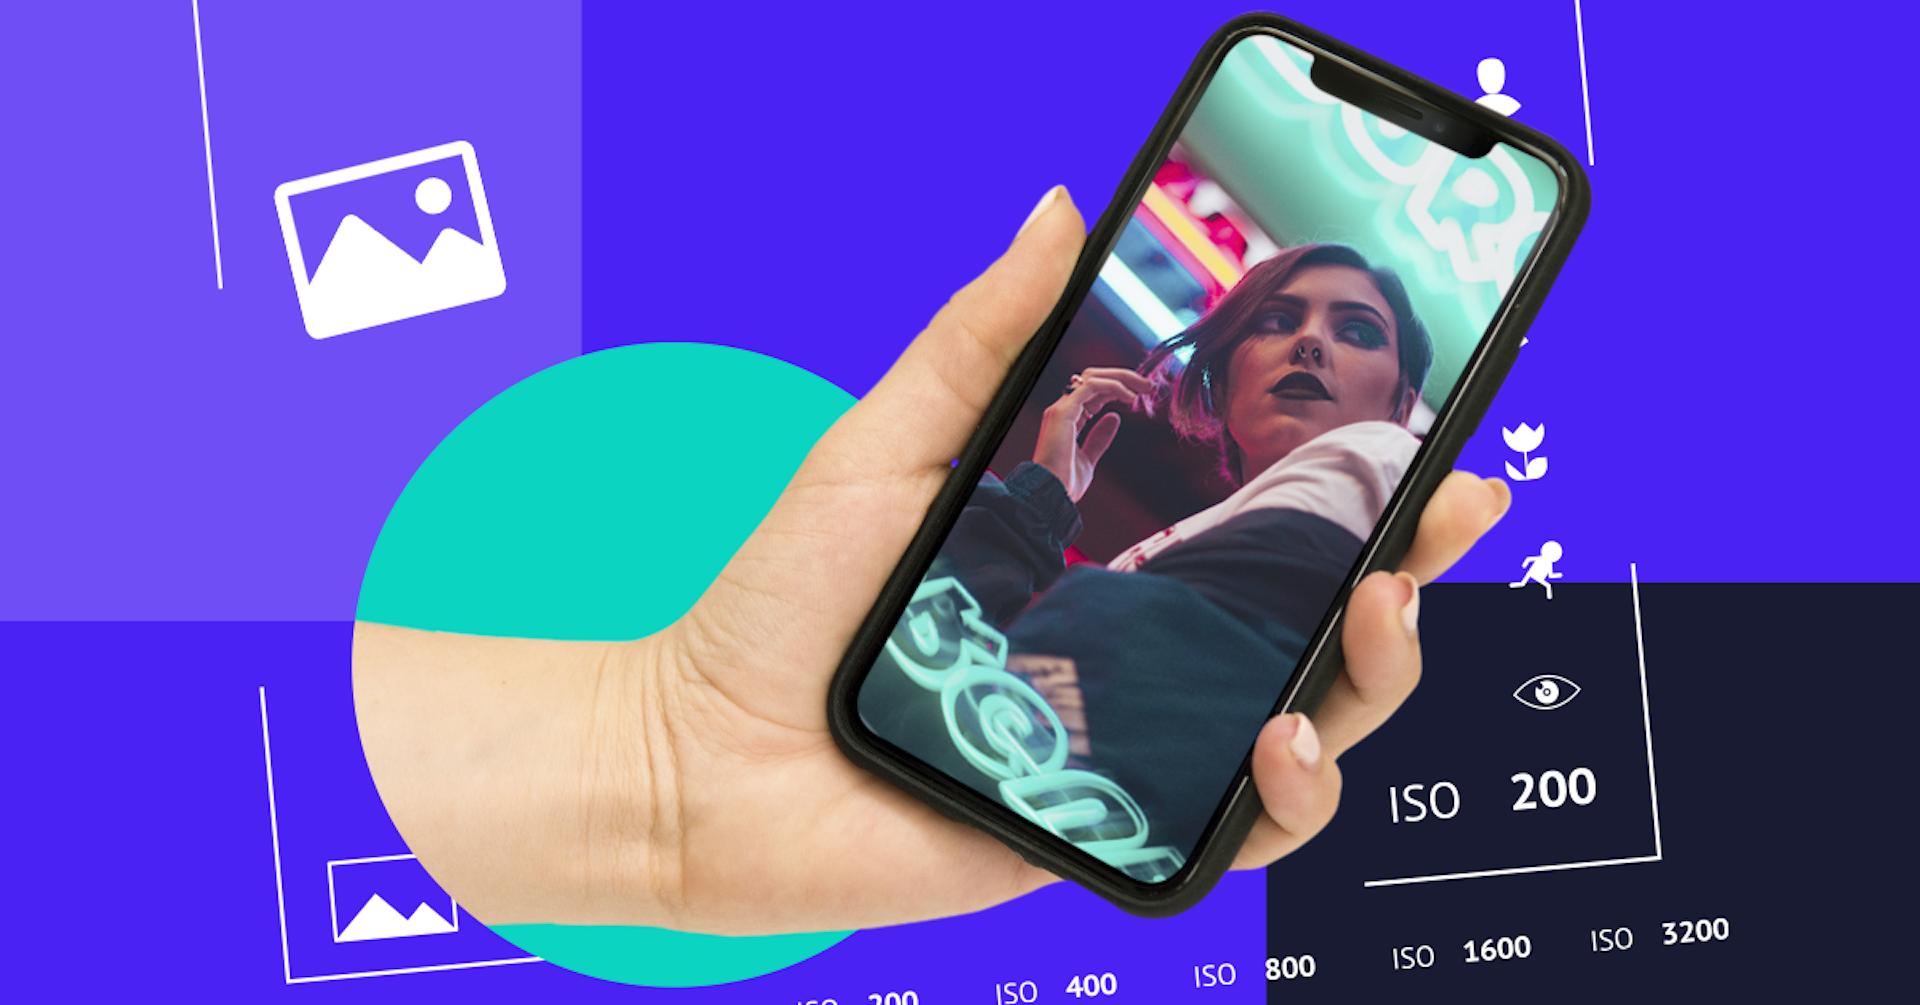 +20 aplicaciones para editar fotos en el celular usadas por influencers